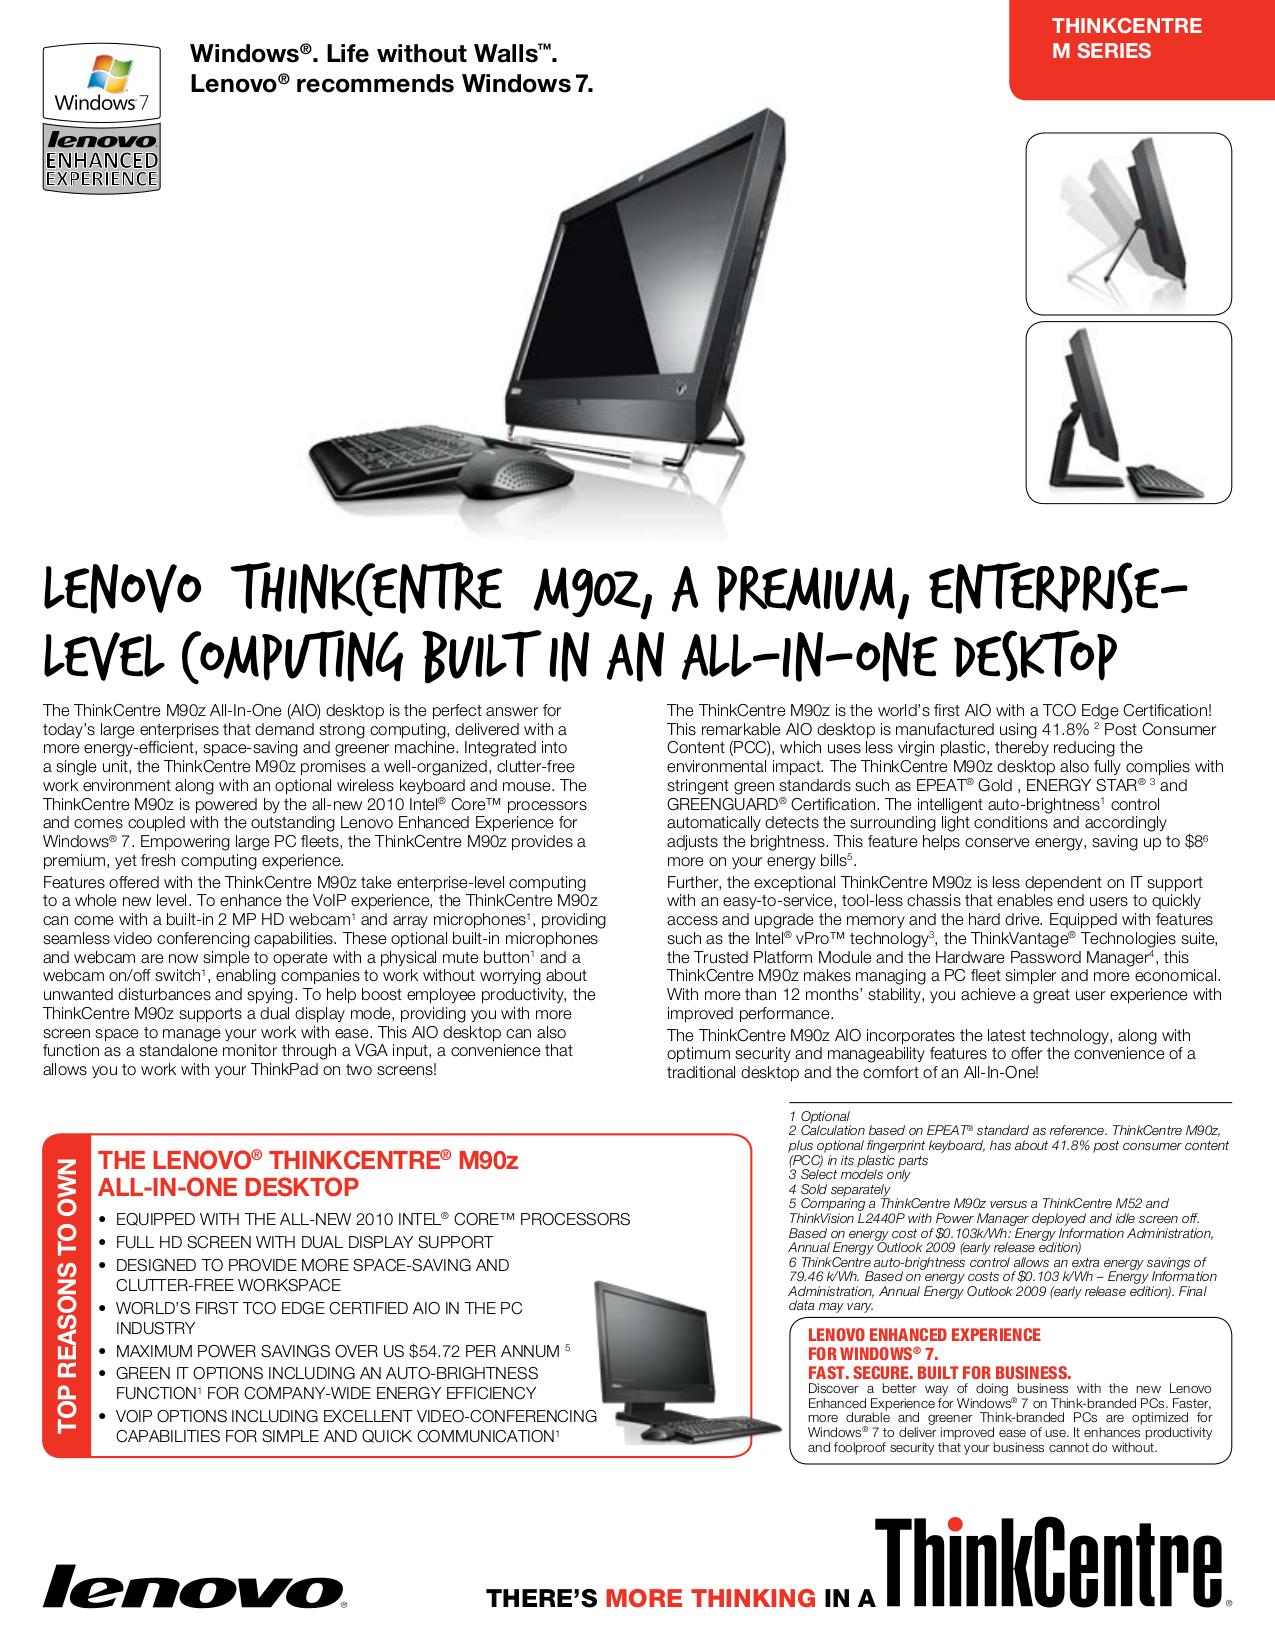 pdf for Lenovo Desktop ThinkCentre M90z 3429 manual